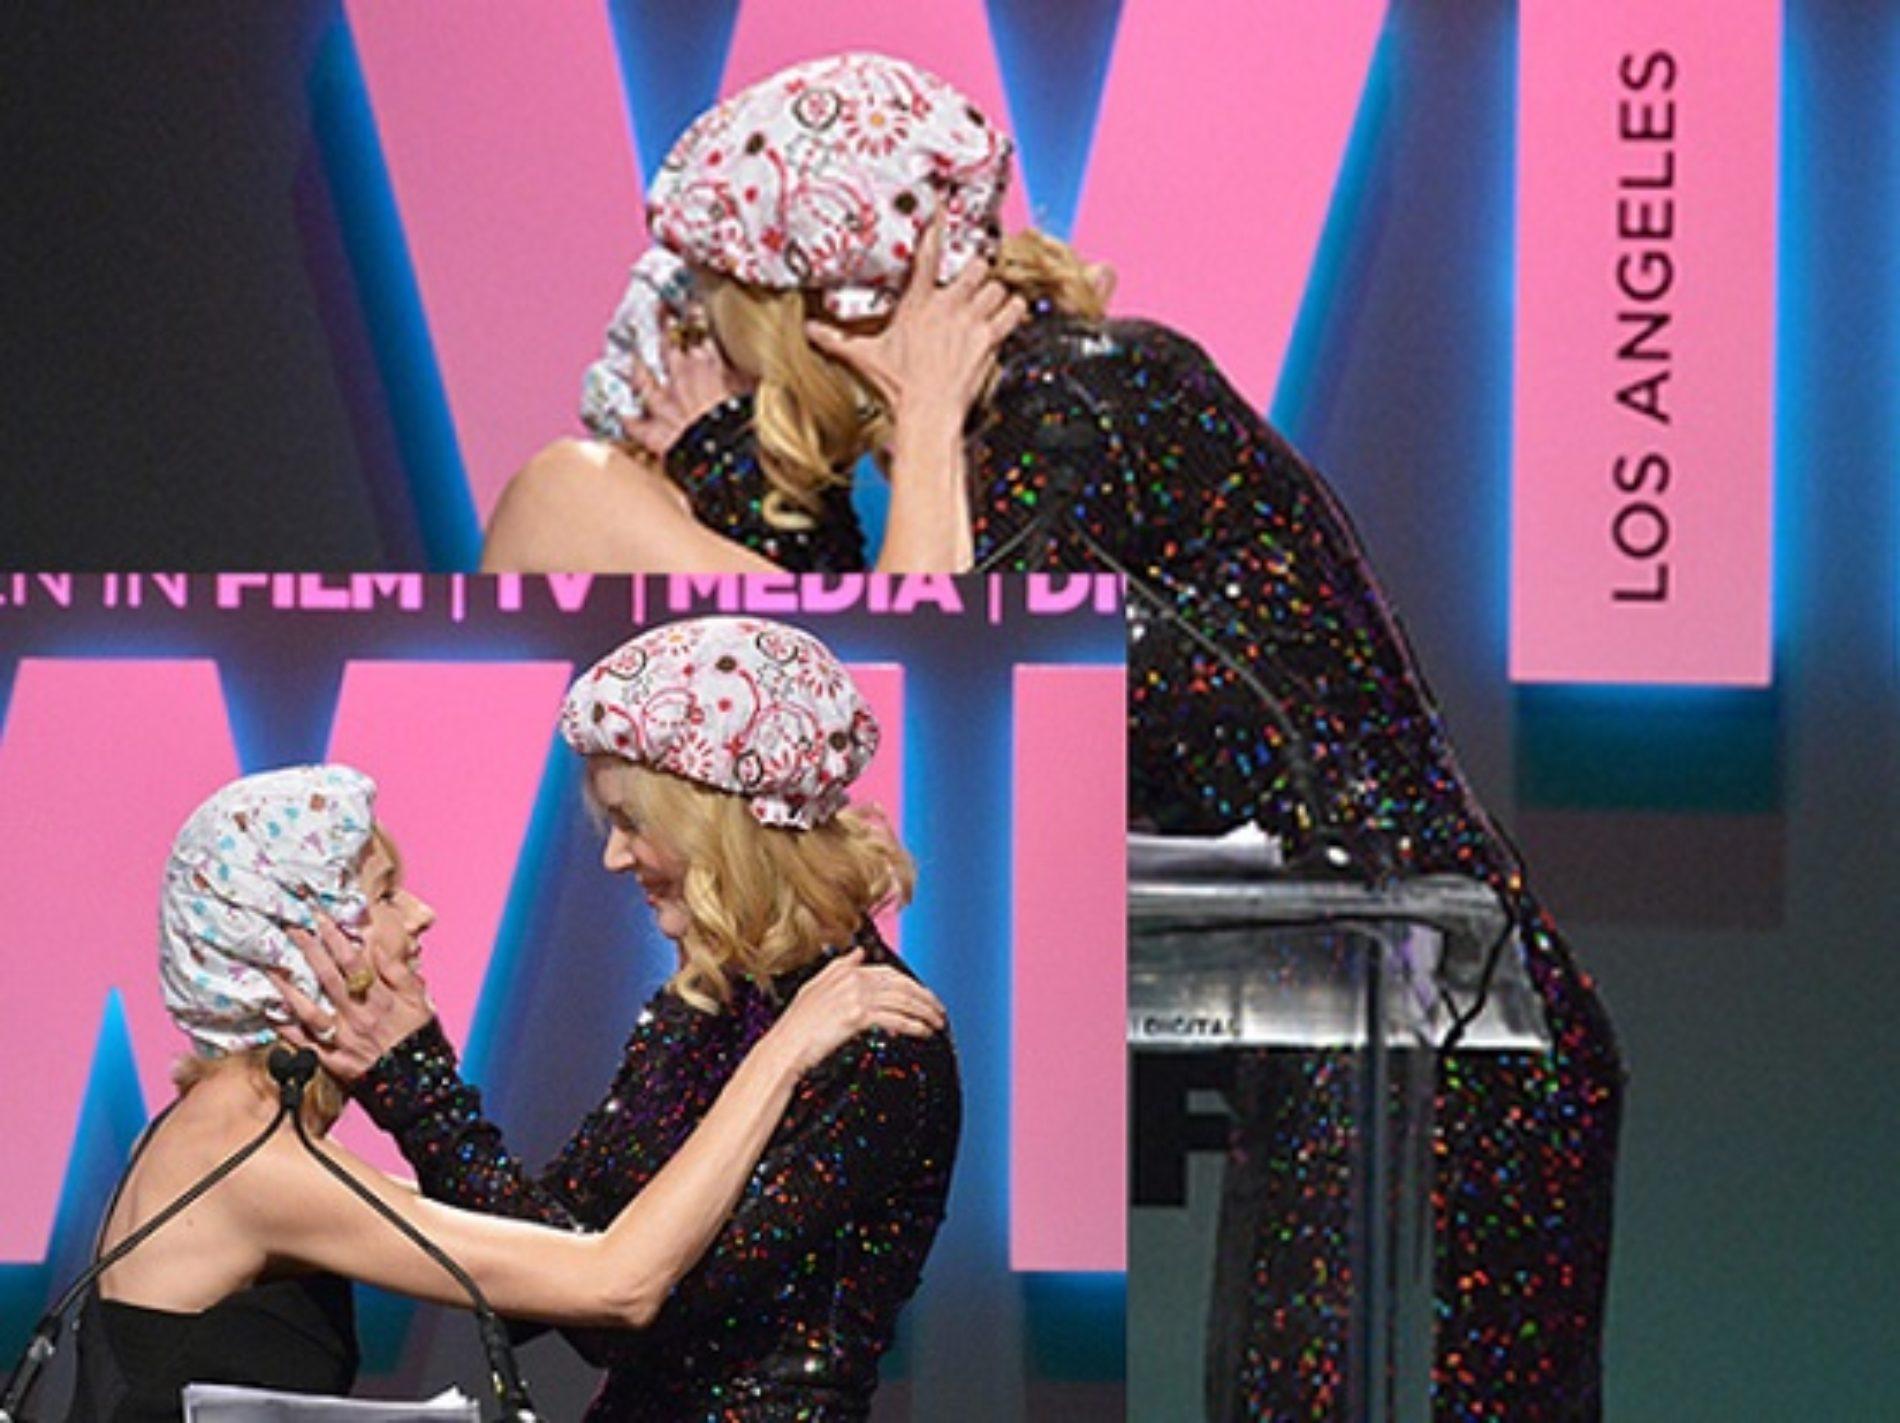 Nicole Kidman Kissed Naomi Watts, Not Apologizing for It